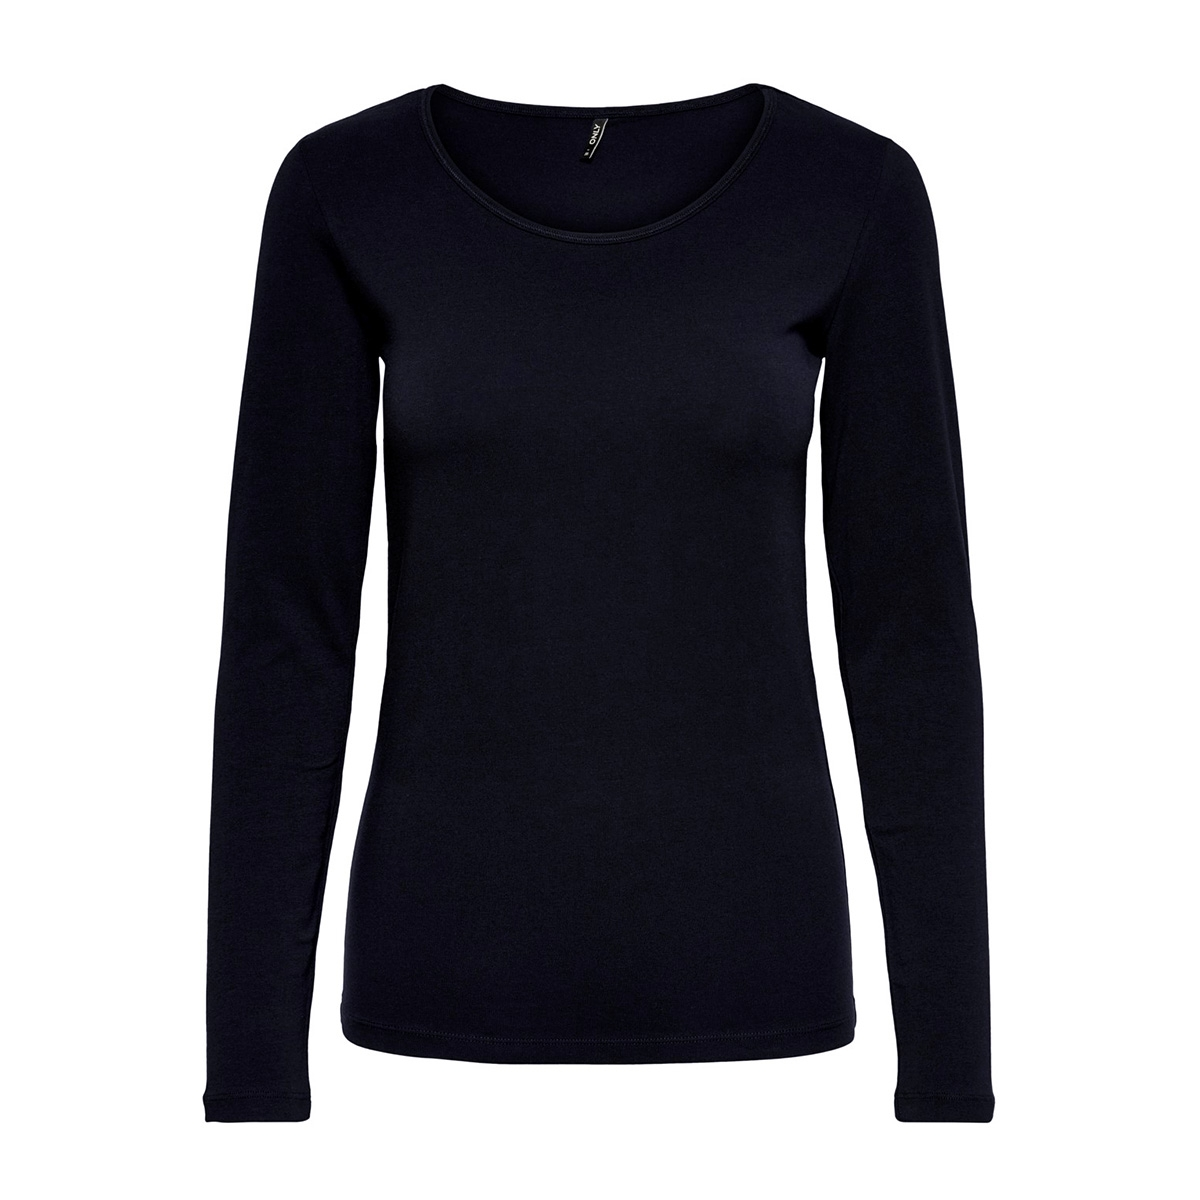 onllive love l/s o-neck top noos jr 15204712 only t-shirt night sky